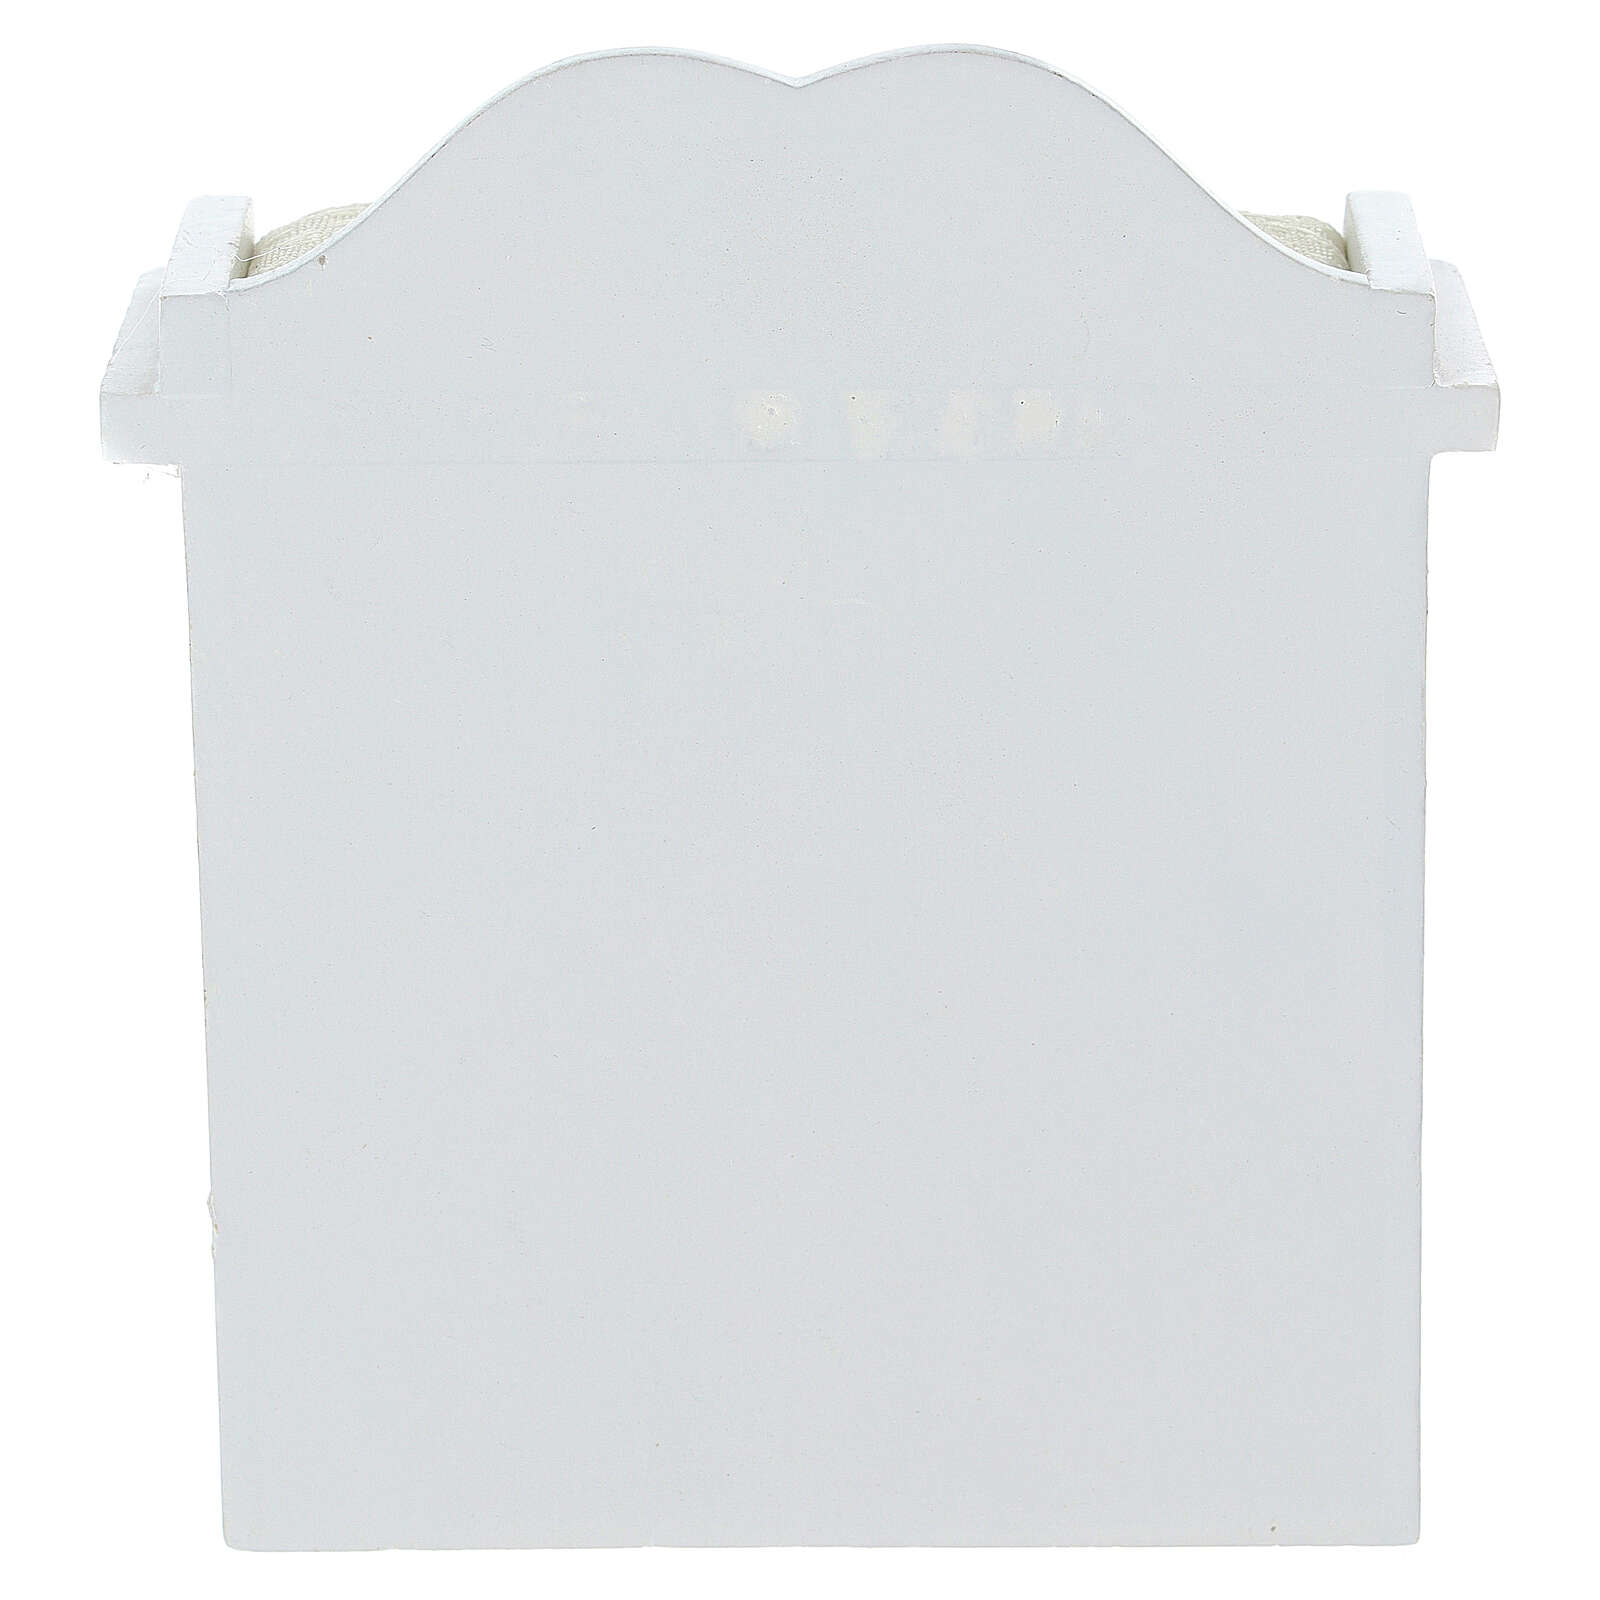 Mobiletto fasciatoio bianco presepe 12-14 cm 4